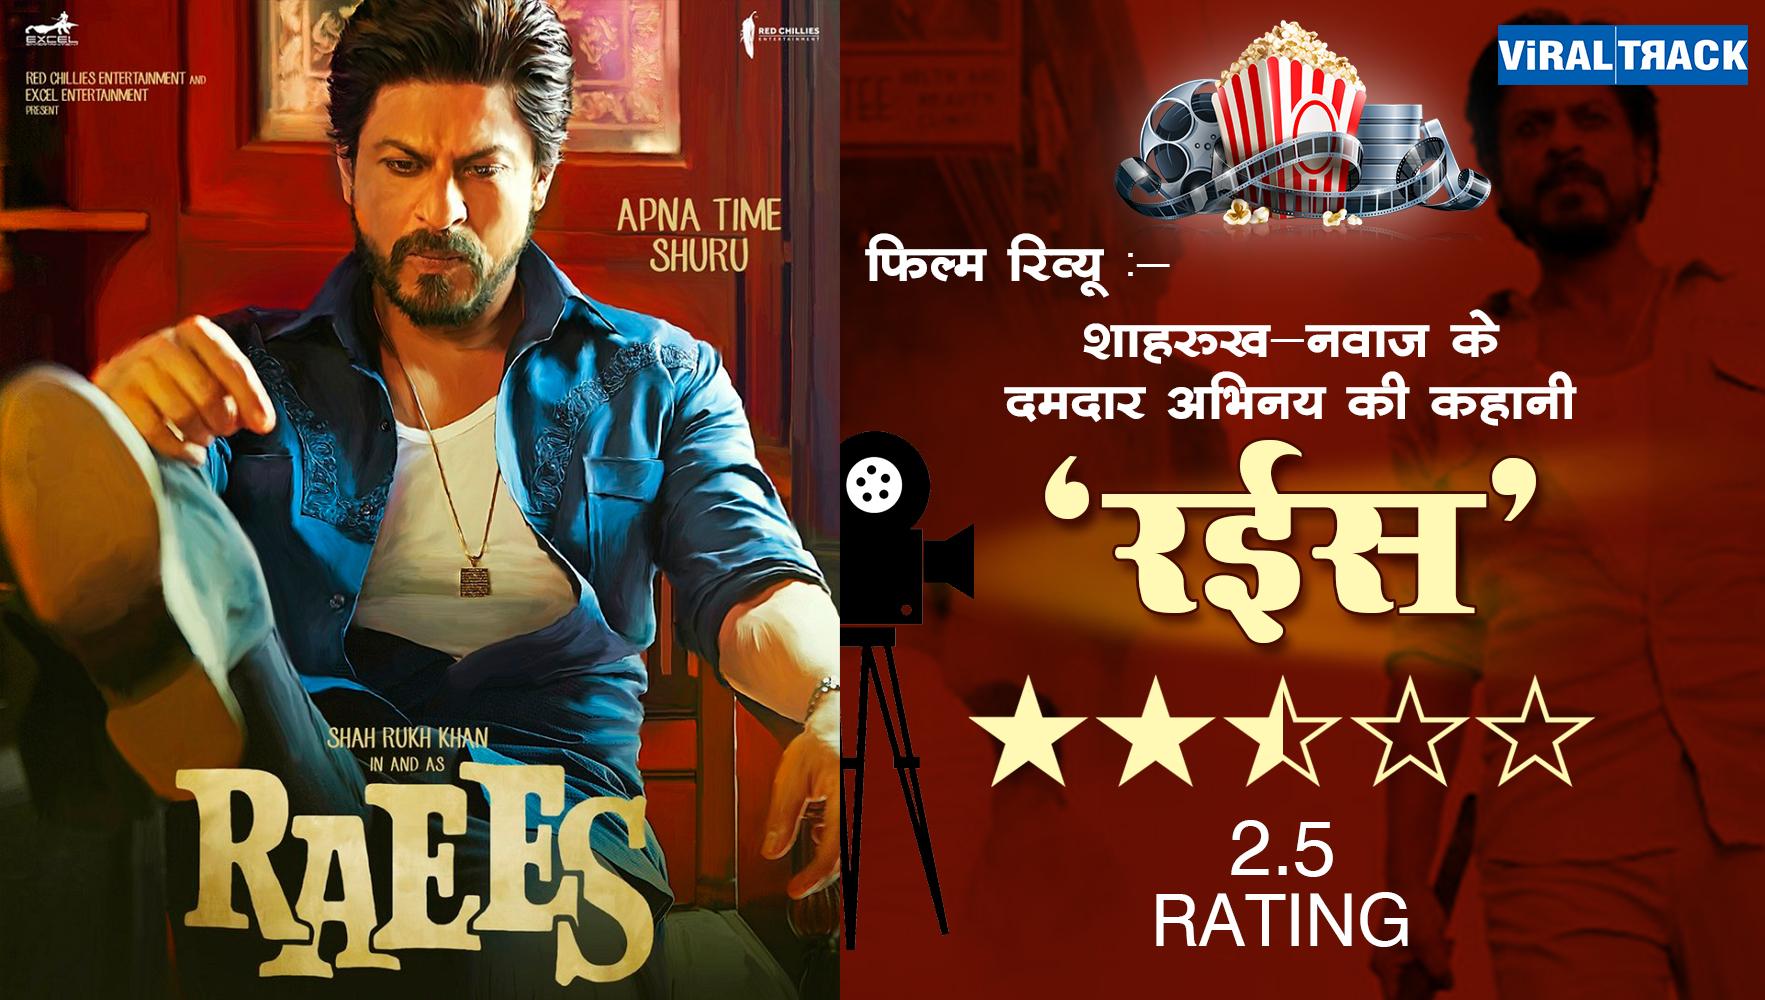 shahrukh khan raees movie review